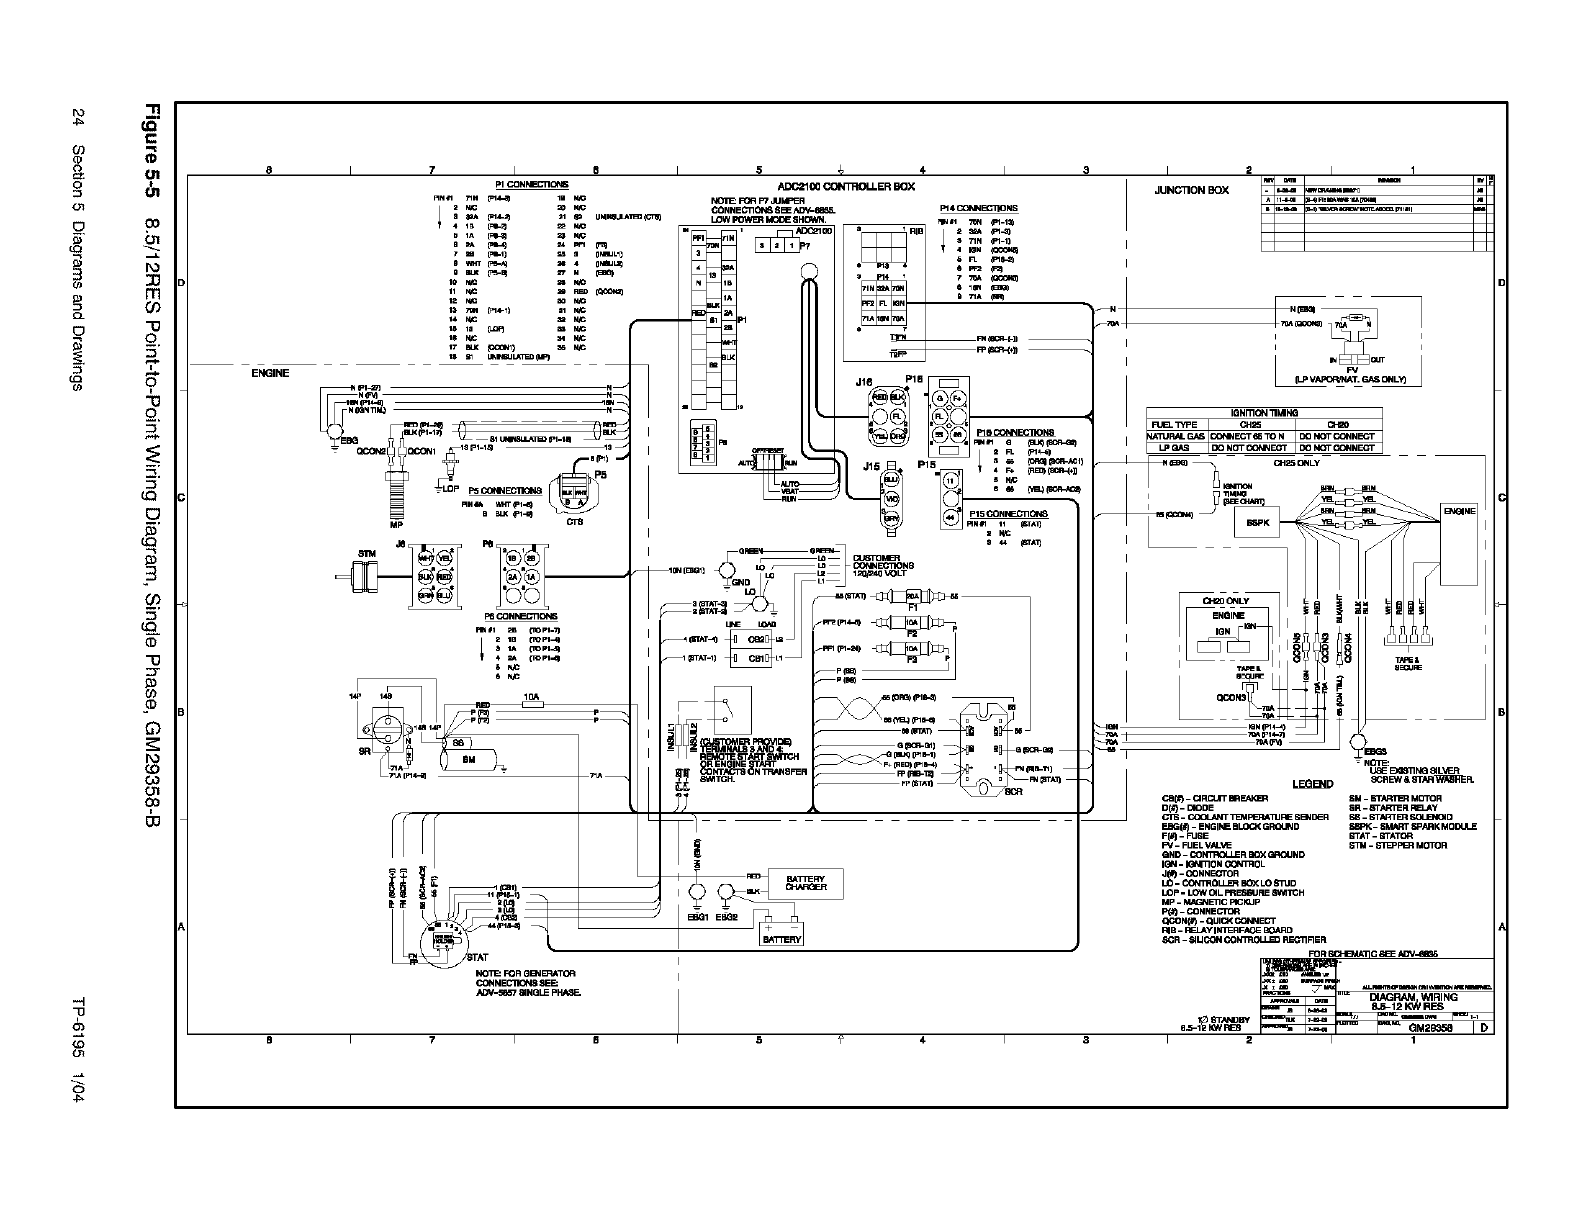 Kohler Generator Wiring Diagram from usermanual.wiki